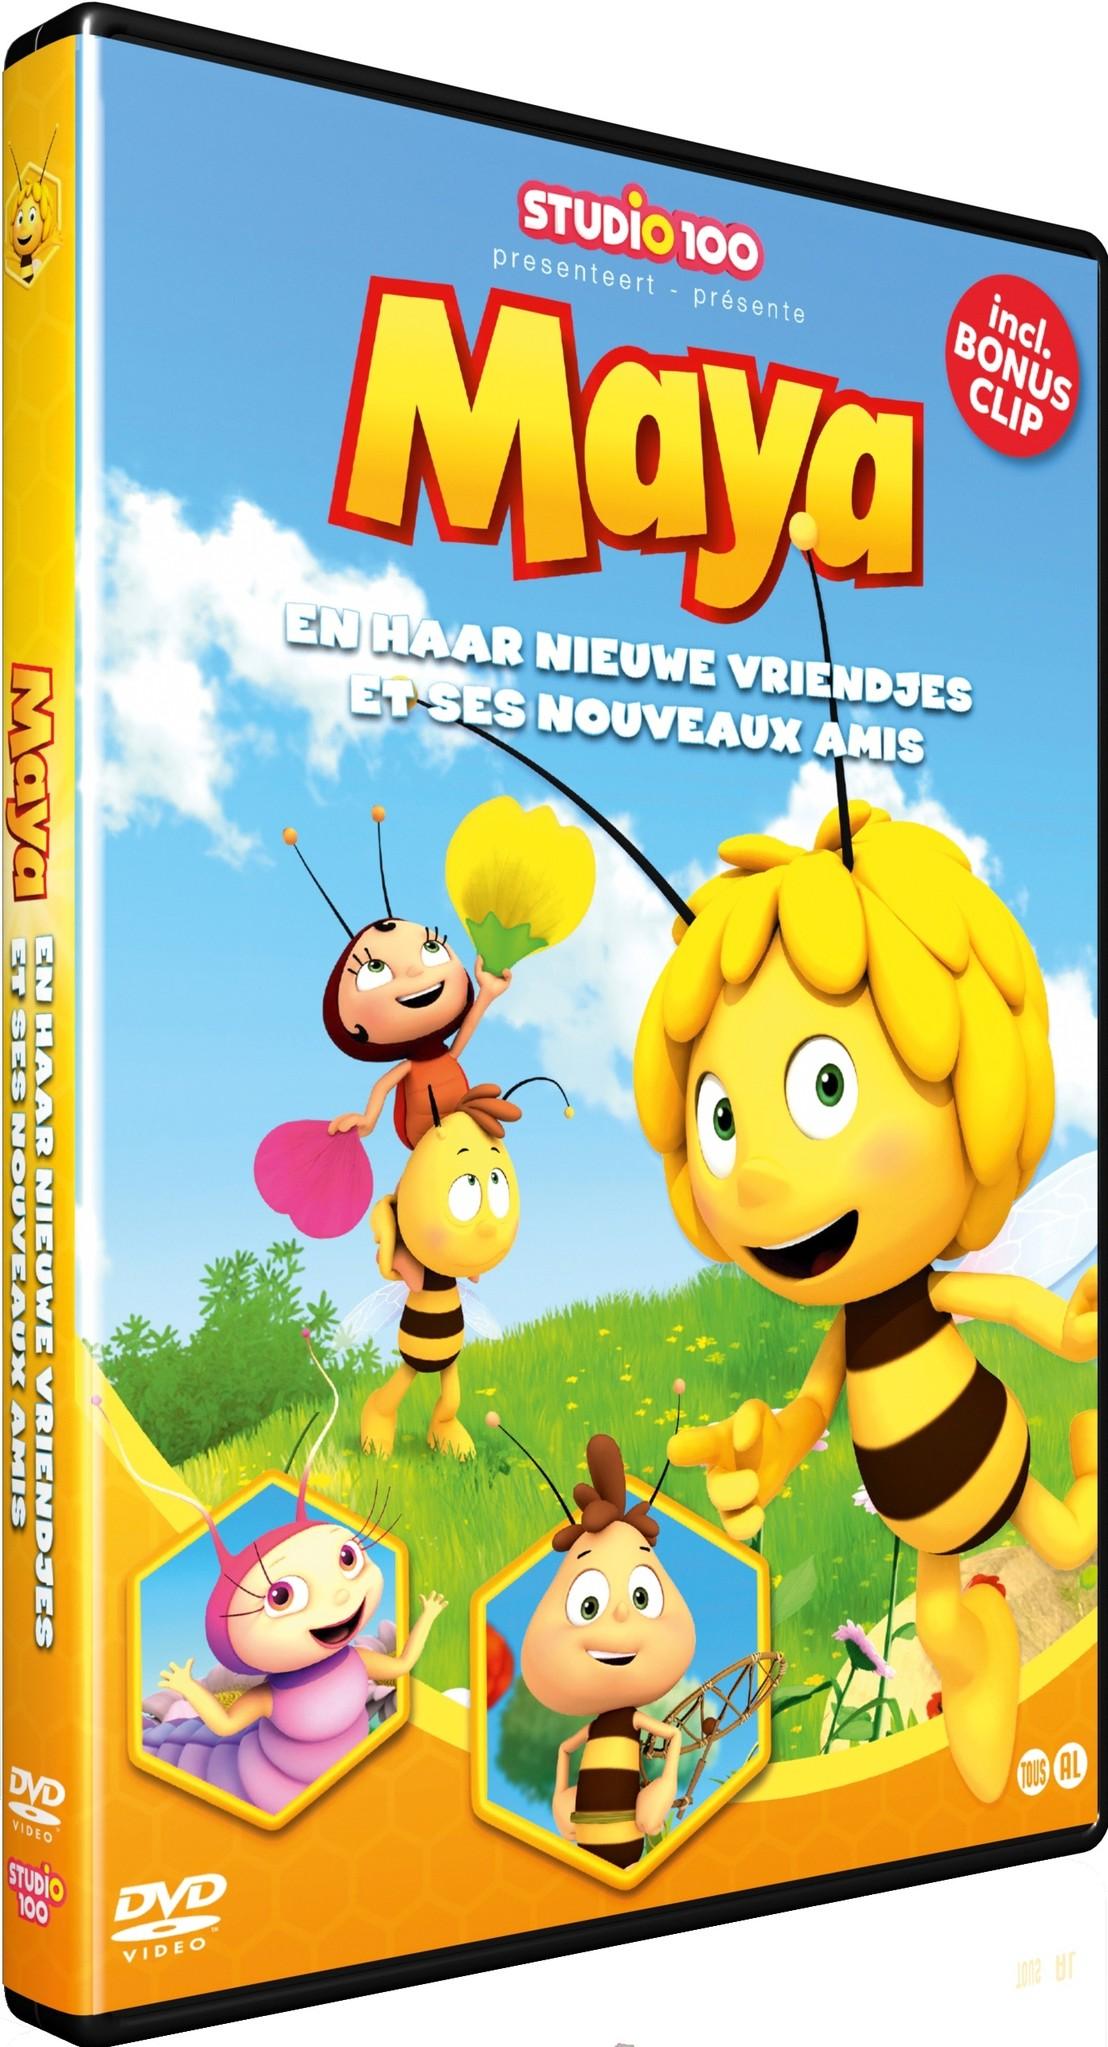 Dvd Maya: Maya and her new friends